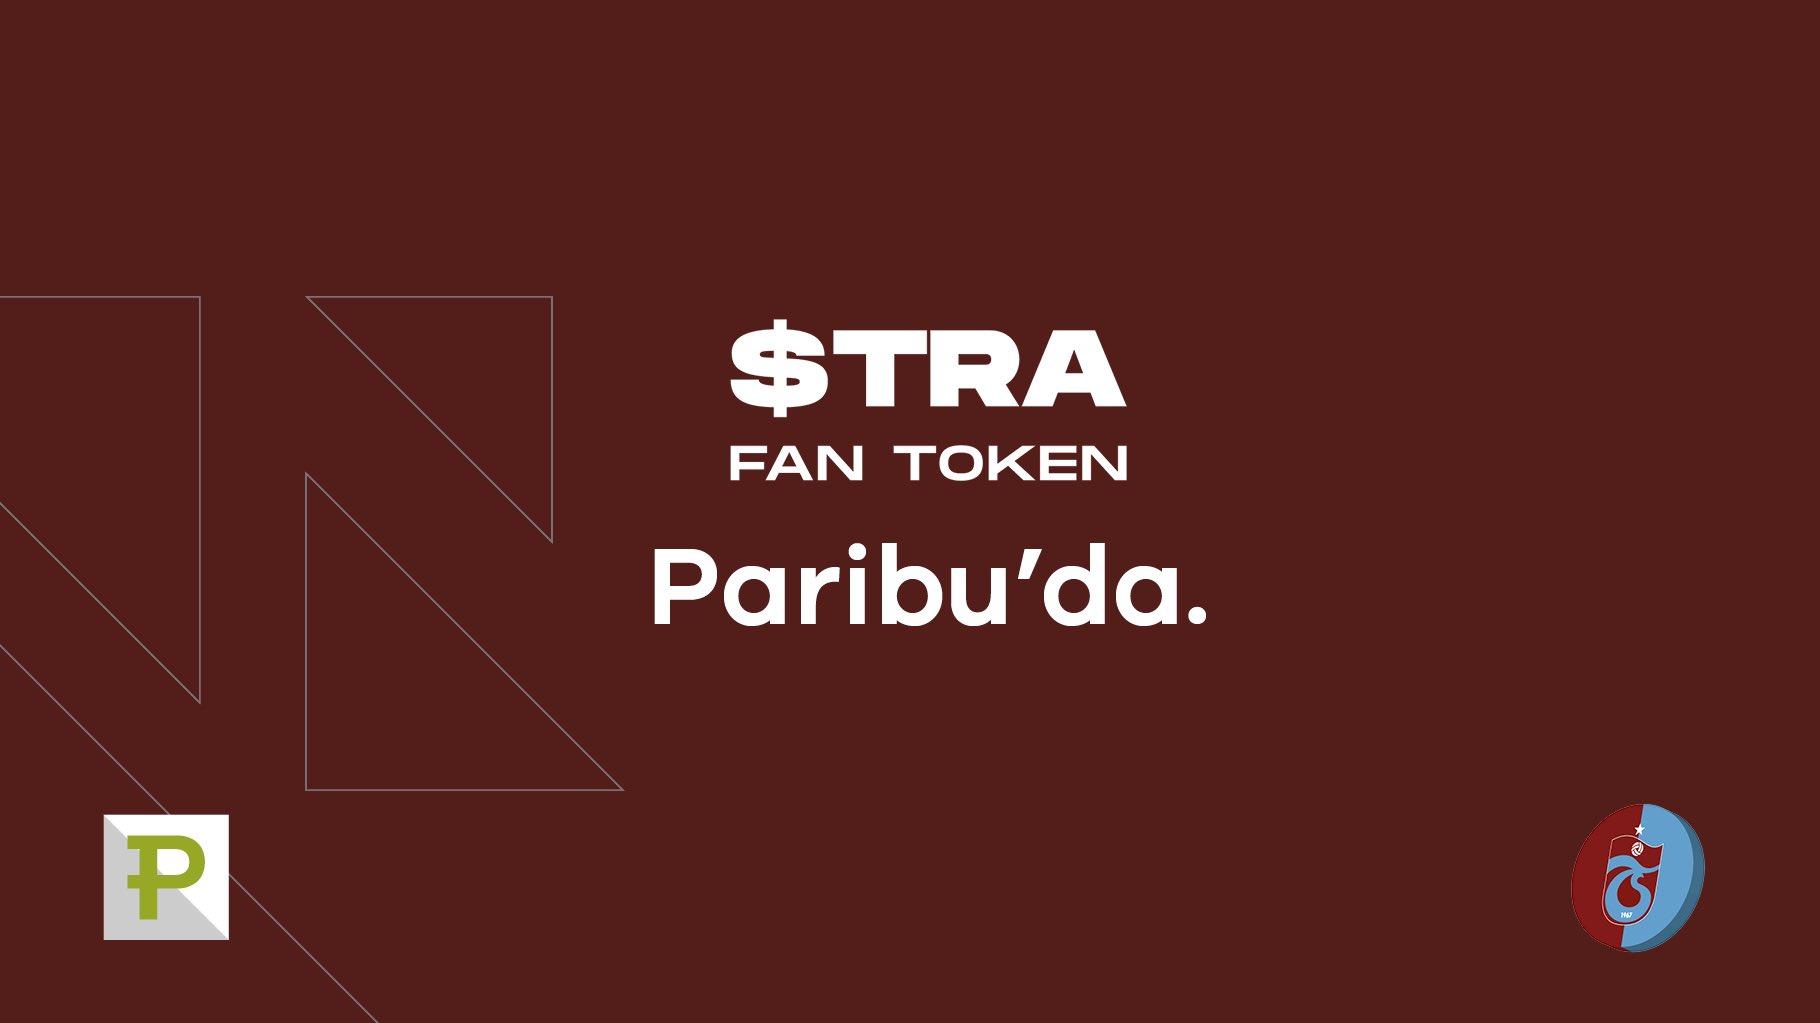 Trabzonspor $TRA Token Paribu'da listelendi